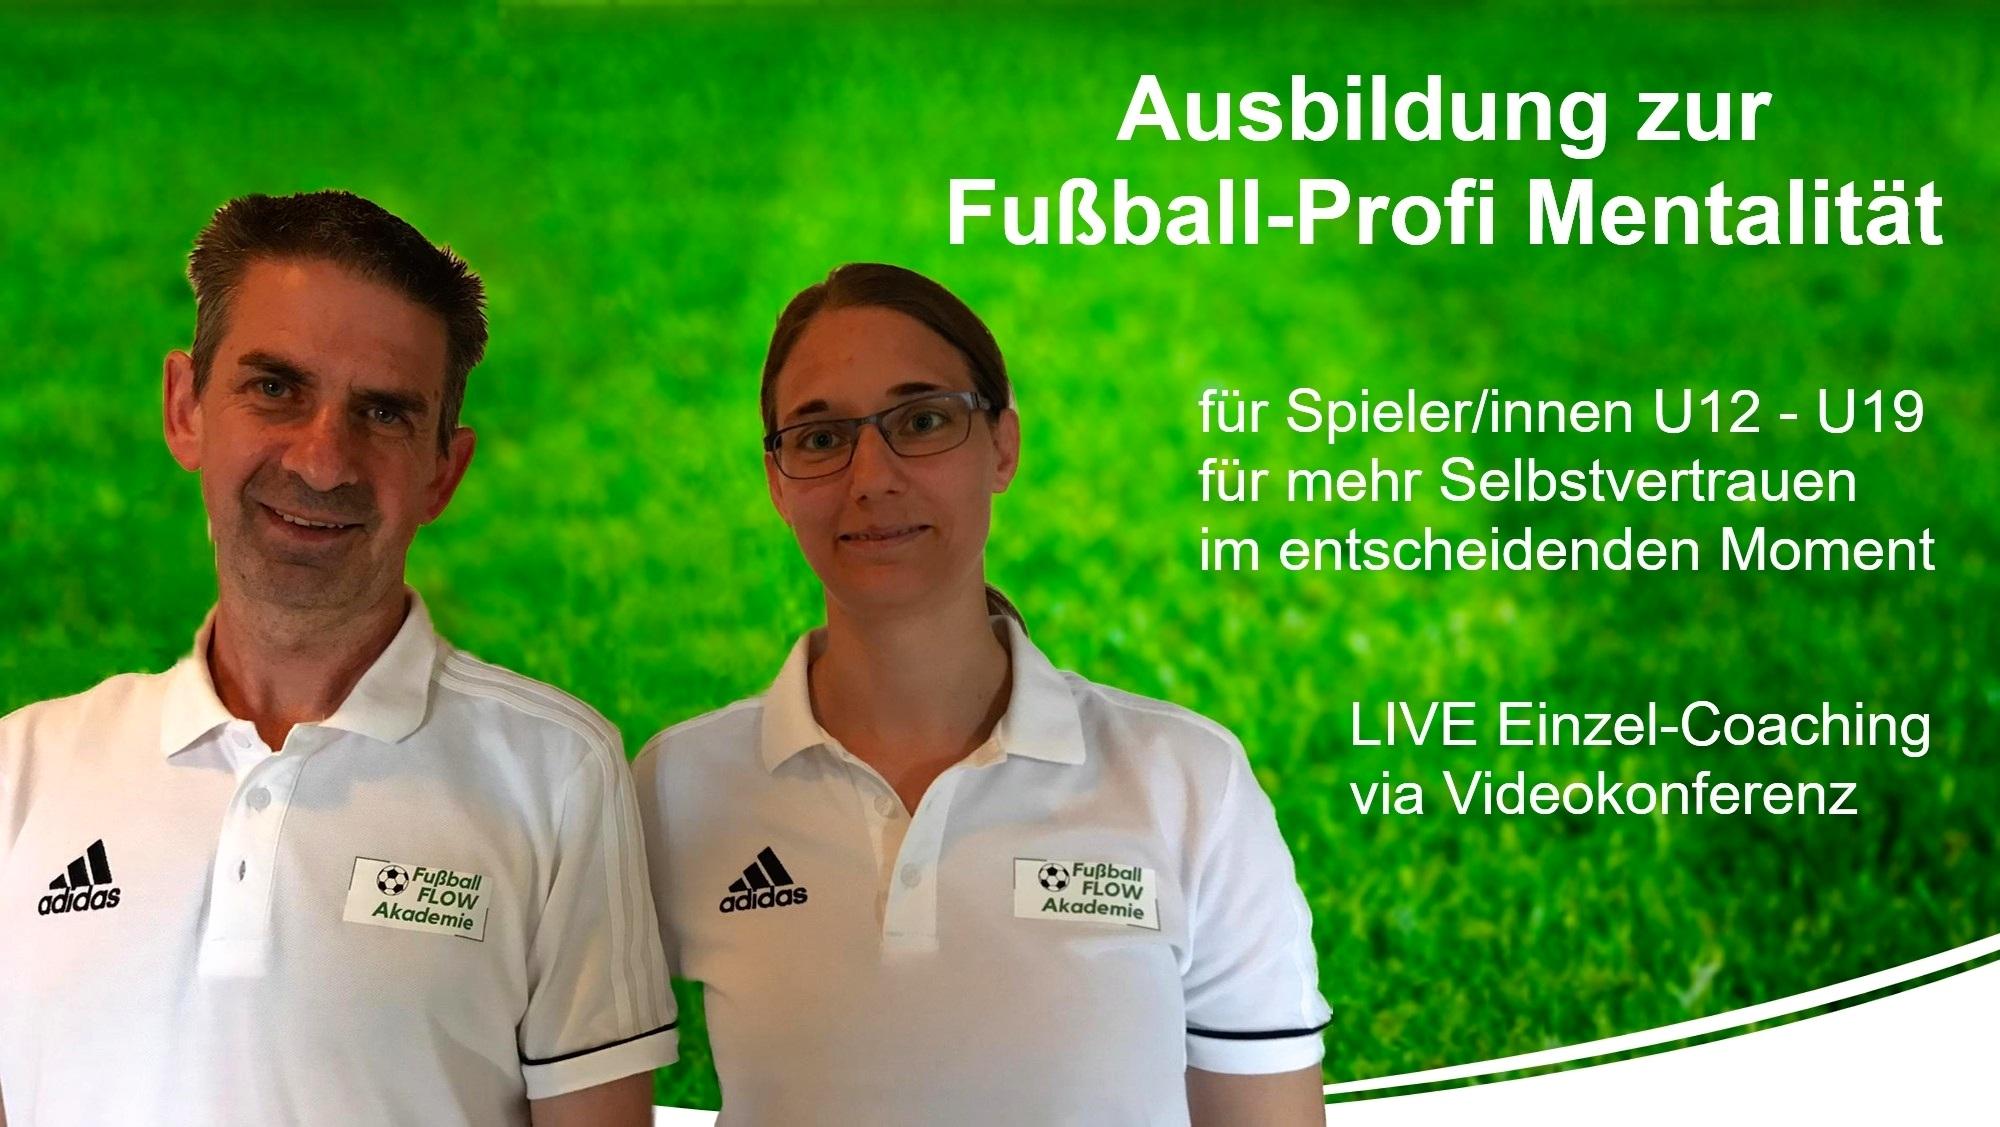 Fussball Flow Akademie, Fussball Selbstvertrauen, mentaltraining, mentalität